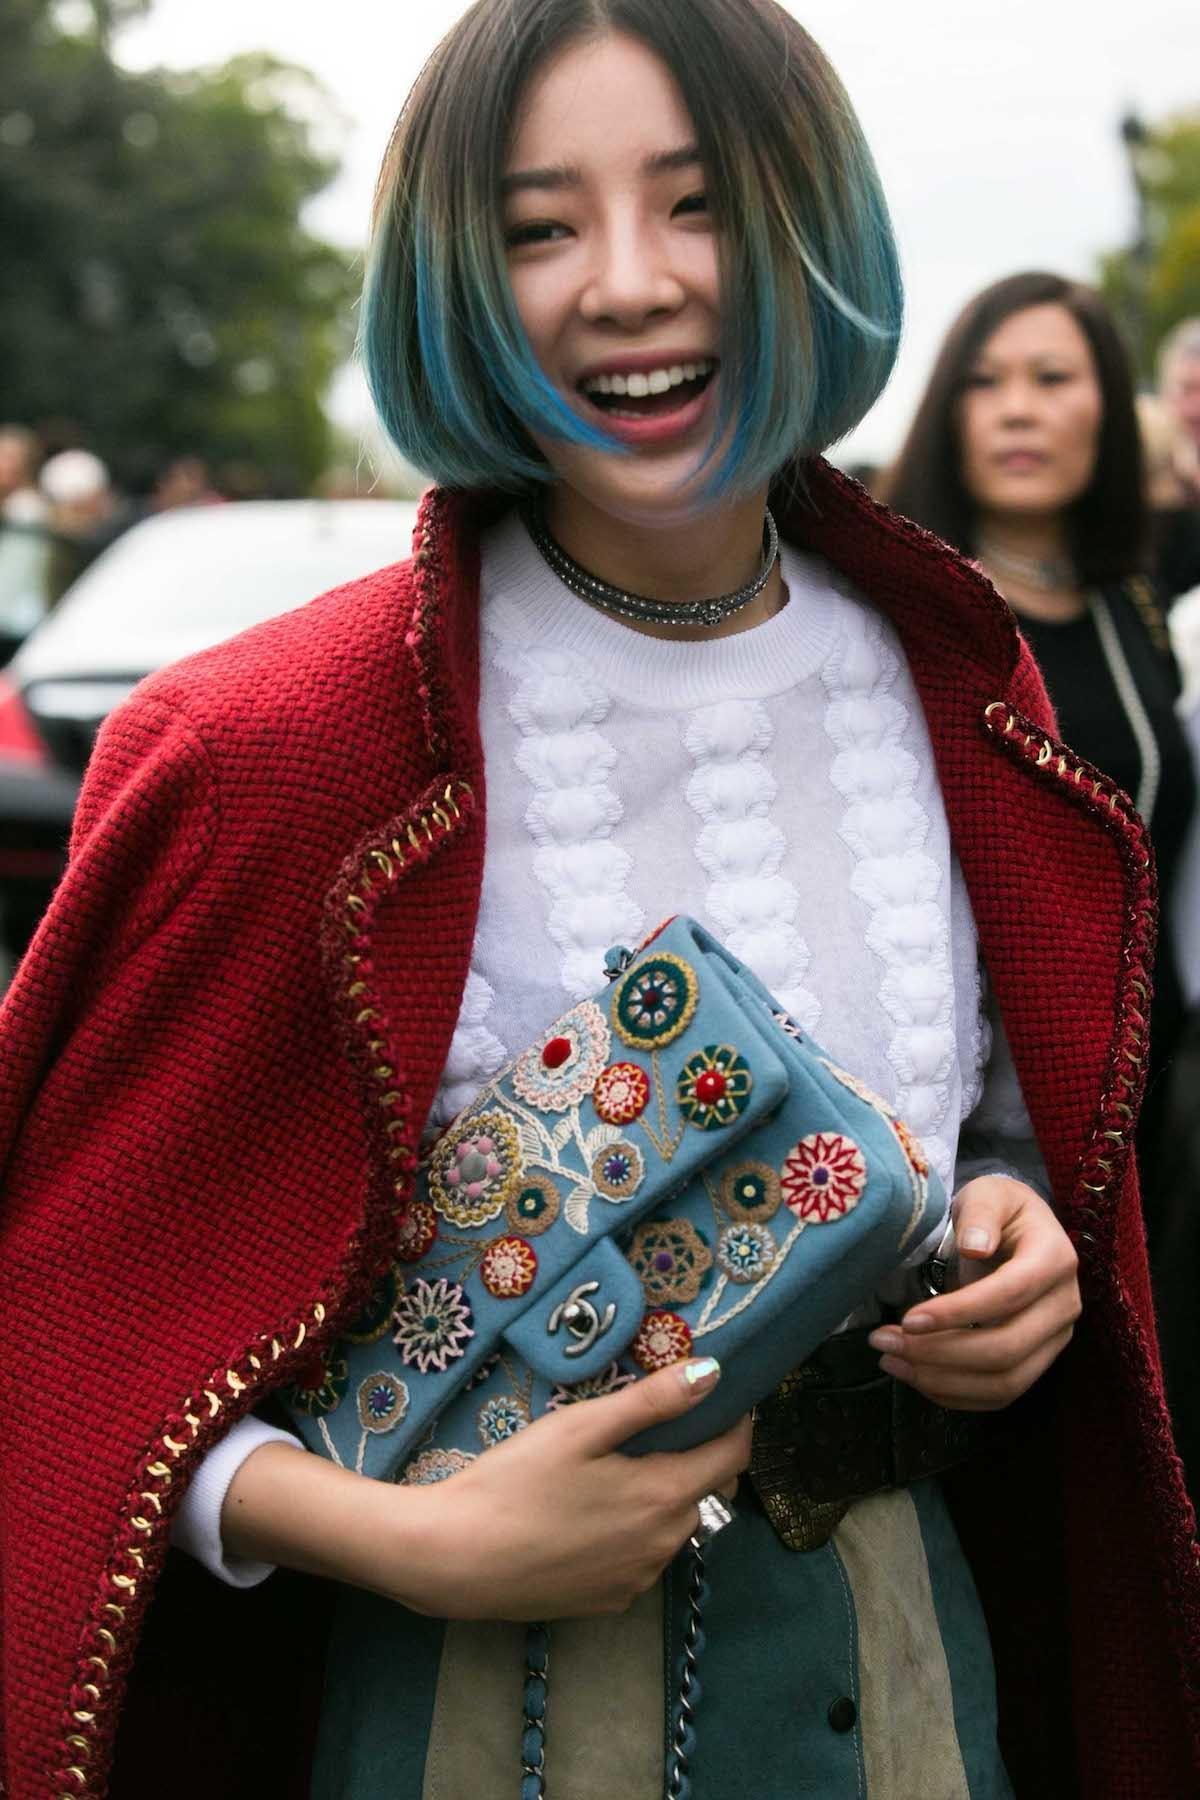 Wanita Asia dengan model rambut pendek a la korea ombre warna ombre cokelat hijau